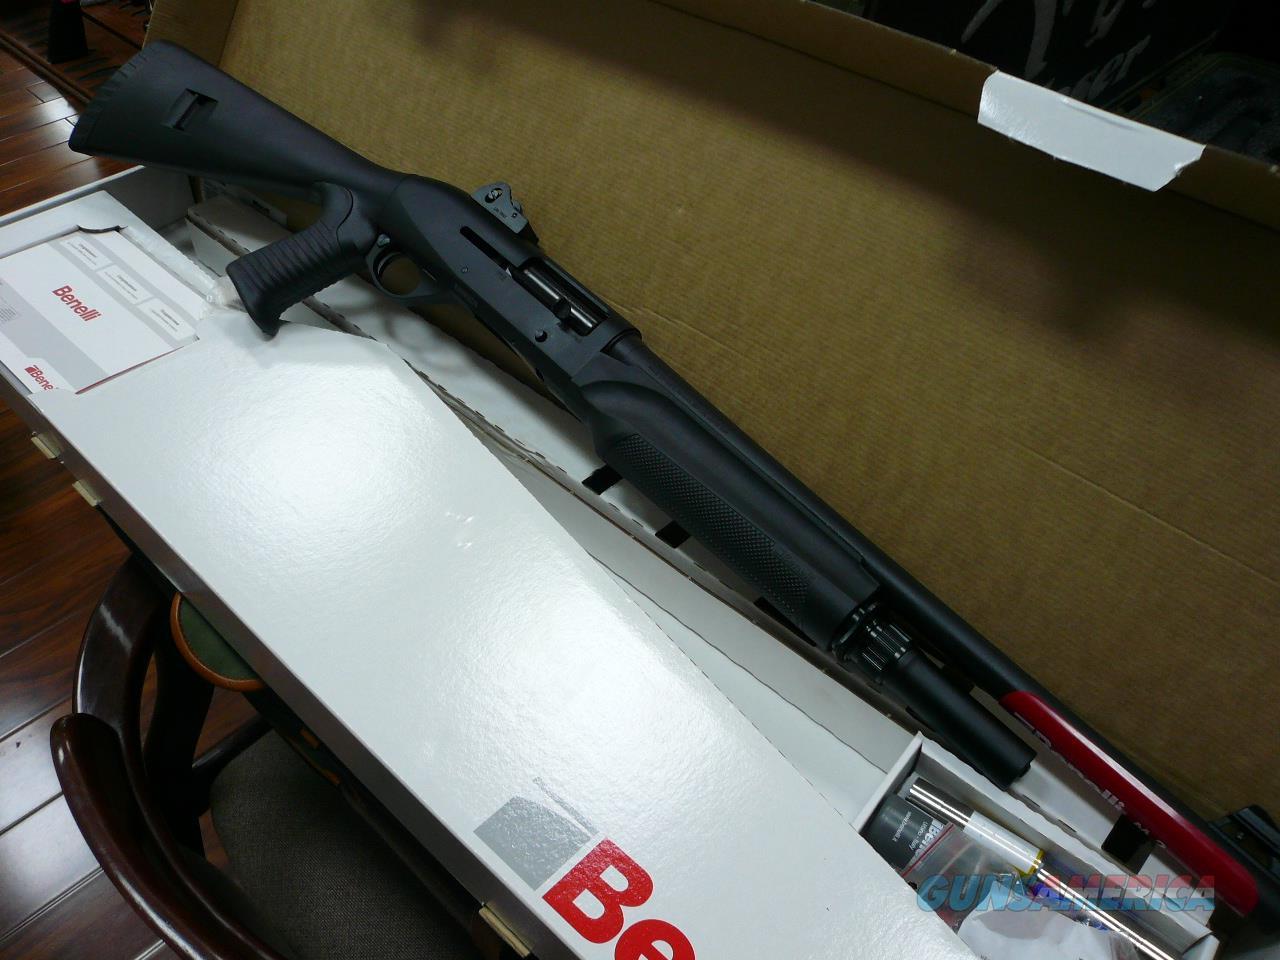 M2-TACTICAL(GOHST RING SIGHTS) 12Ga. NIB  Guns > Shotguns > Benelli Shotguns > Tactical